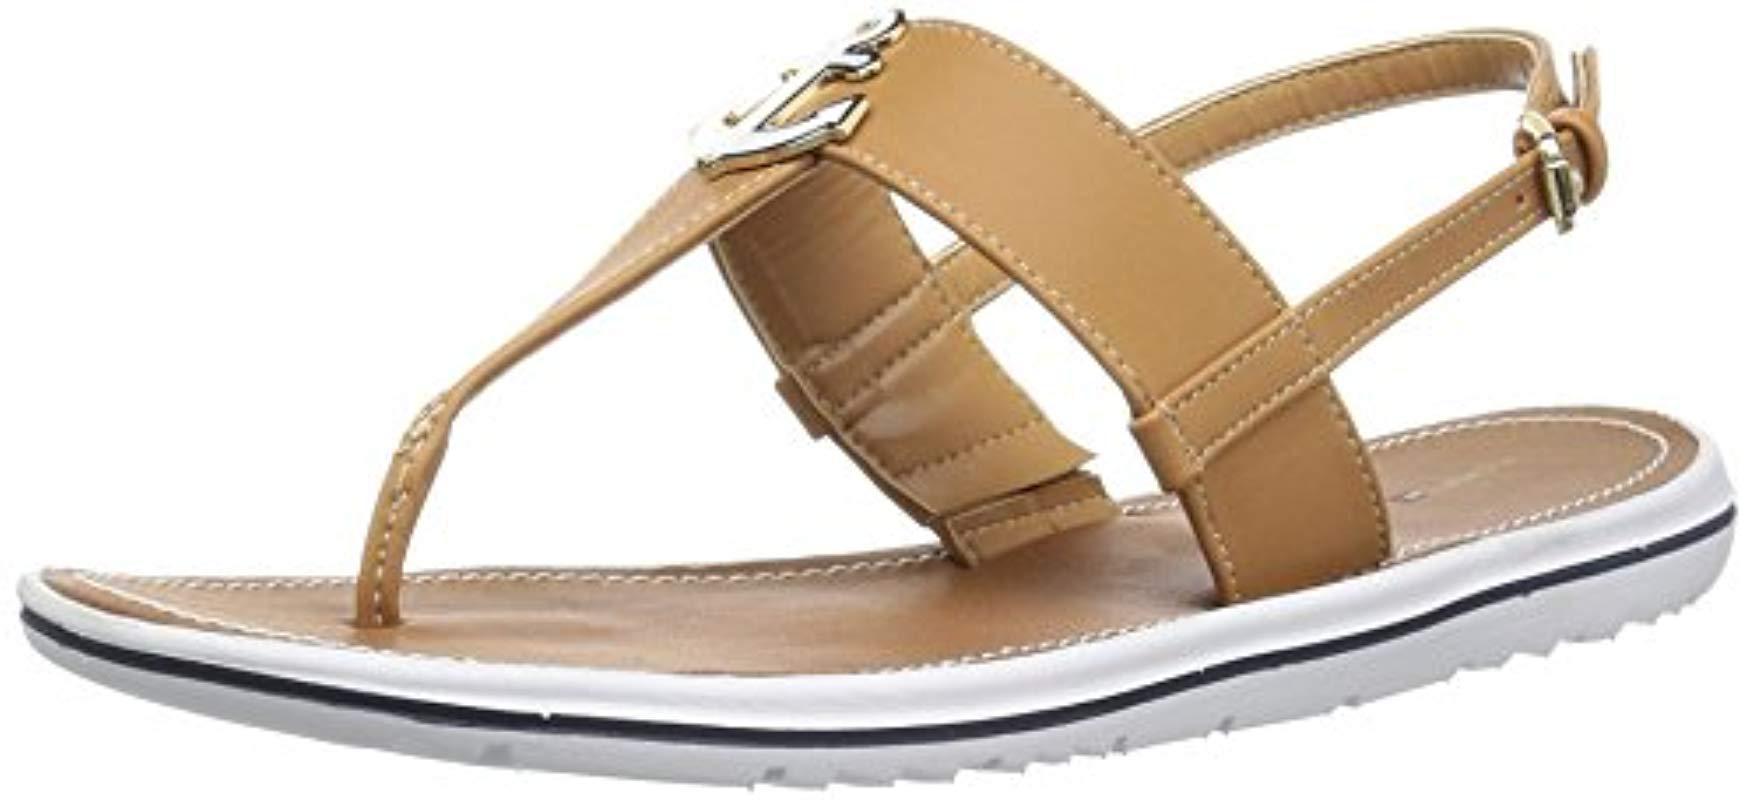 e83548fa3 Lyst - Tommy Hilfiger Galiant Flat Sandal - Save 22%